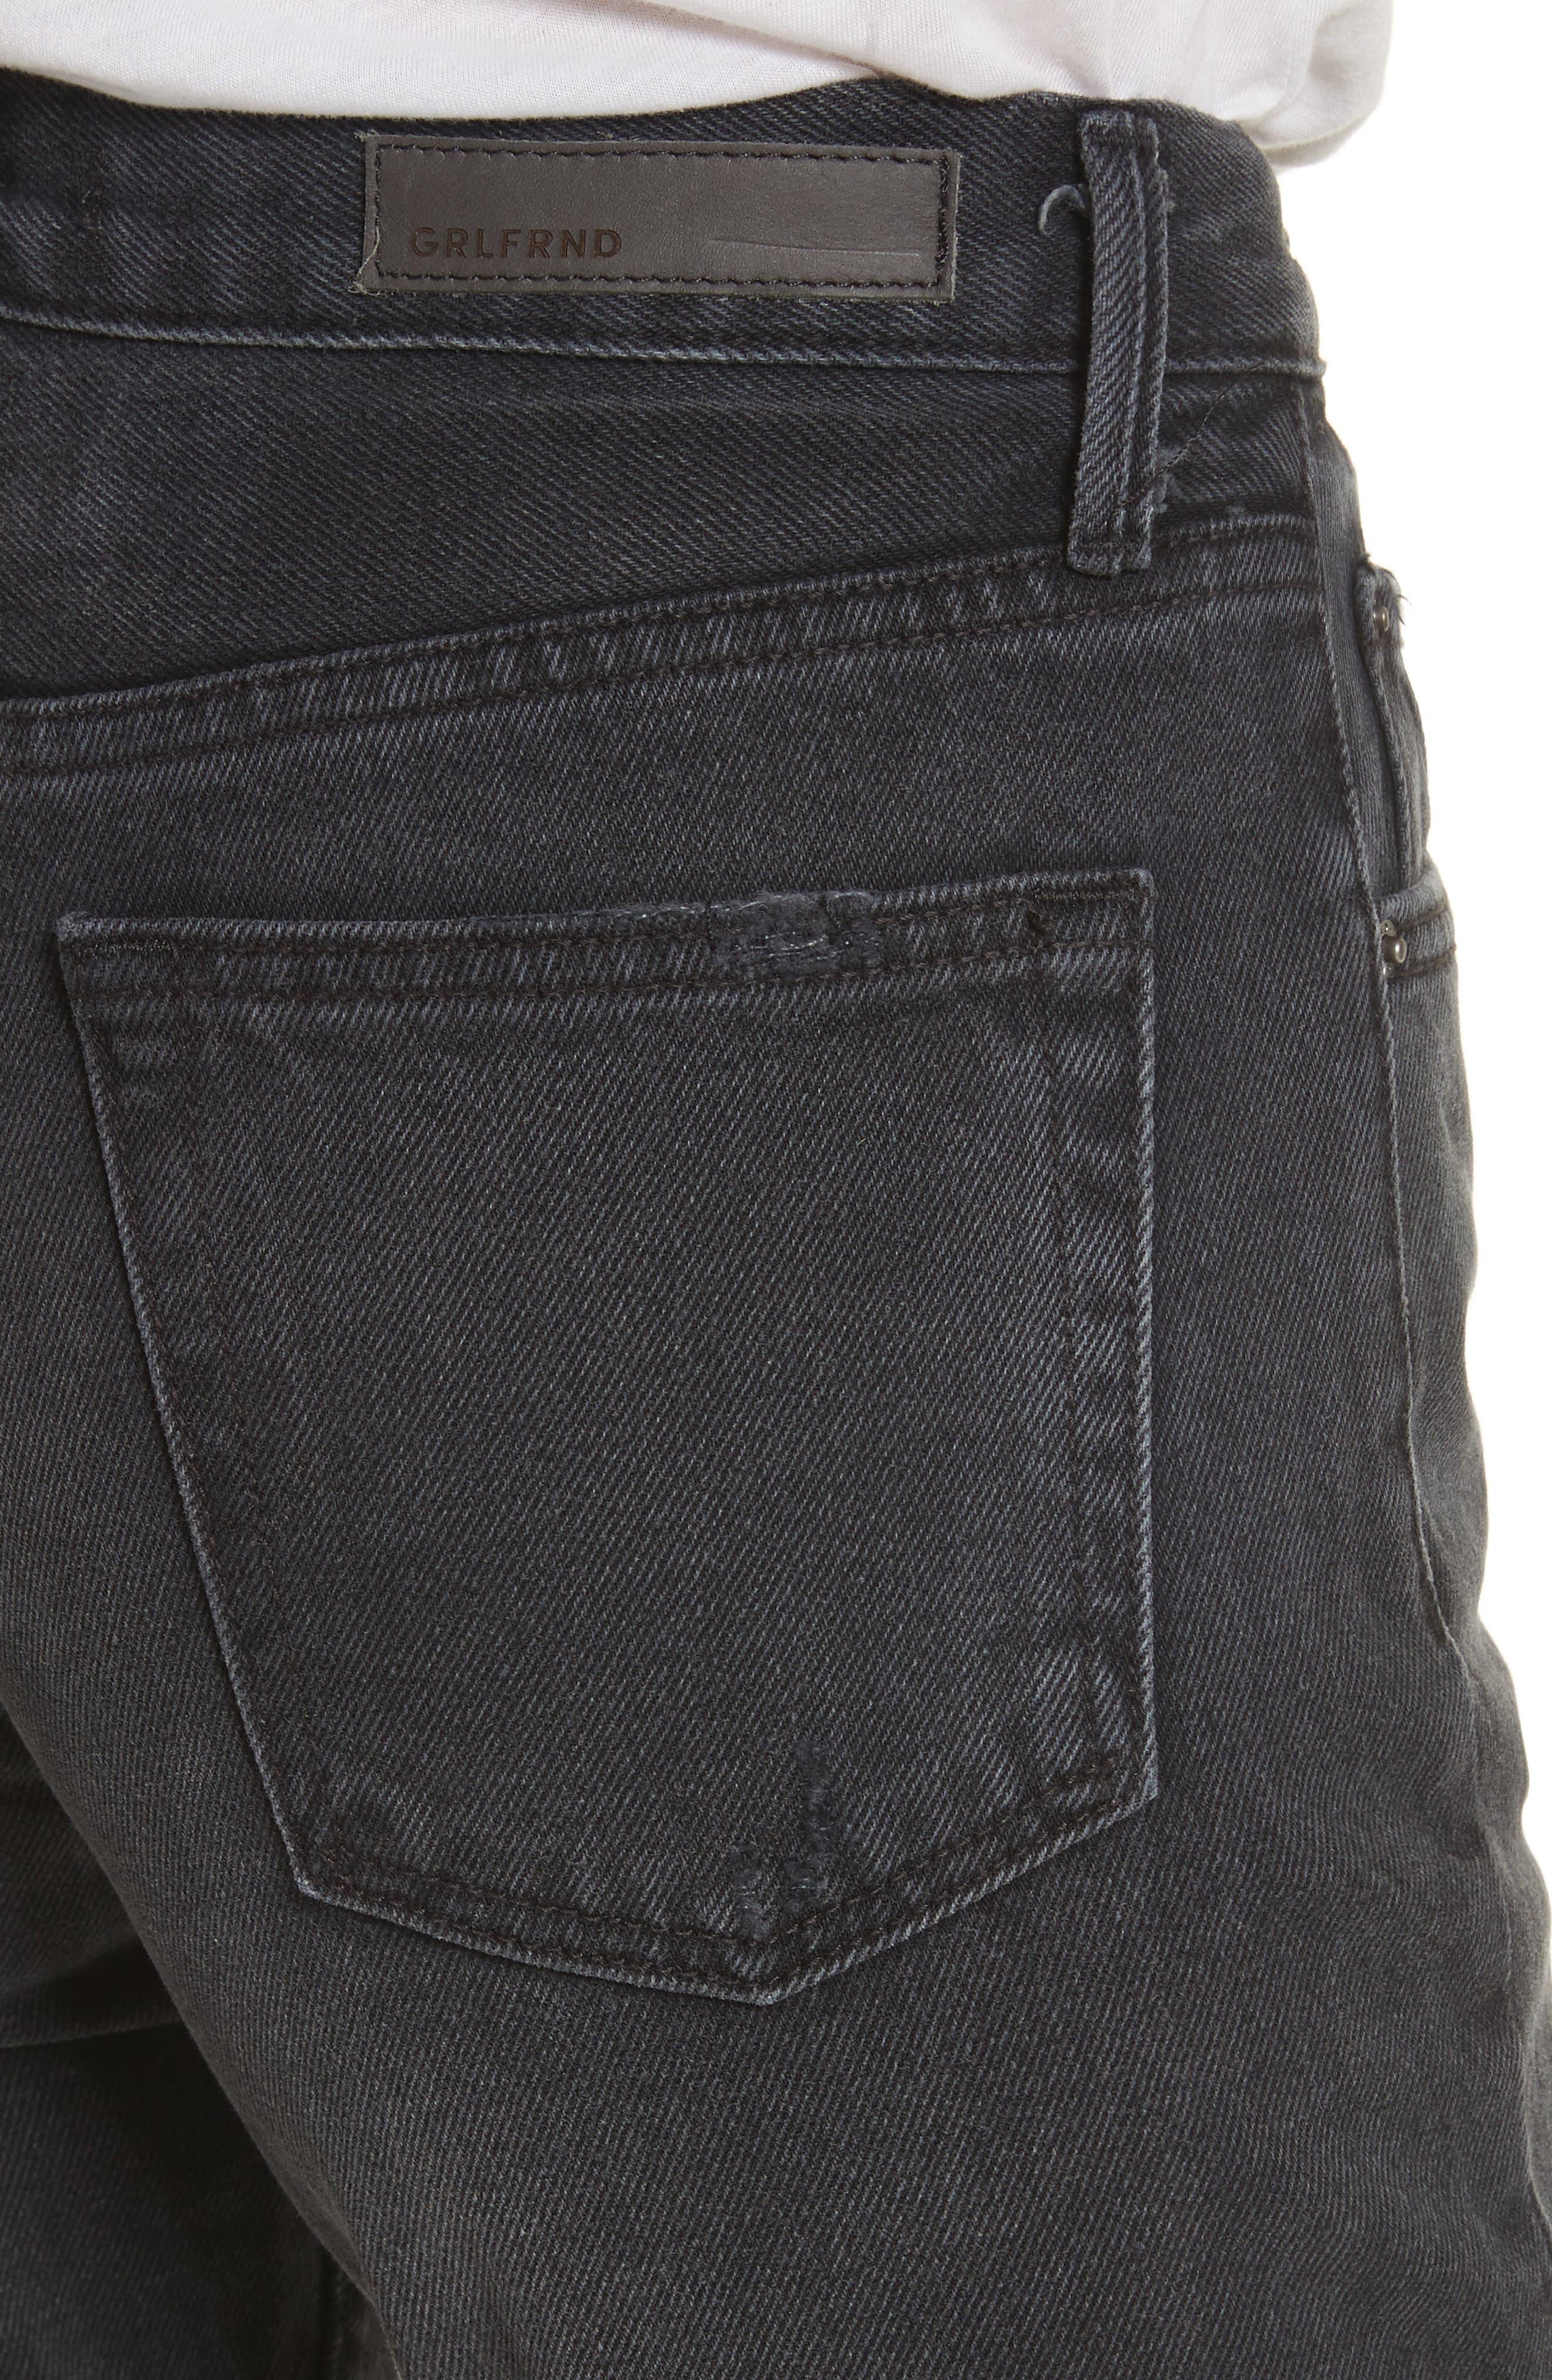 Alternate Image 4  - GRLFRND Helena Rigid High Waist Straight Jeans (Proud Mary)